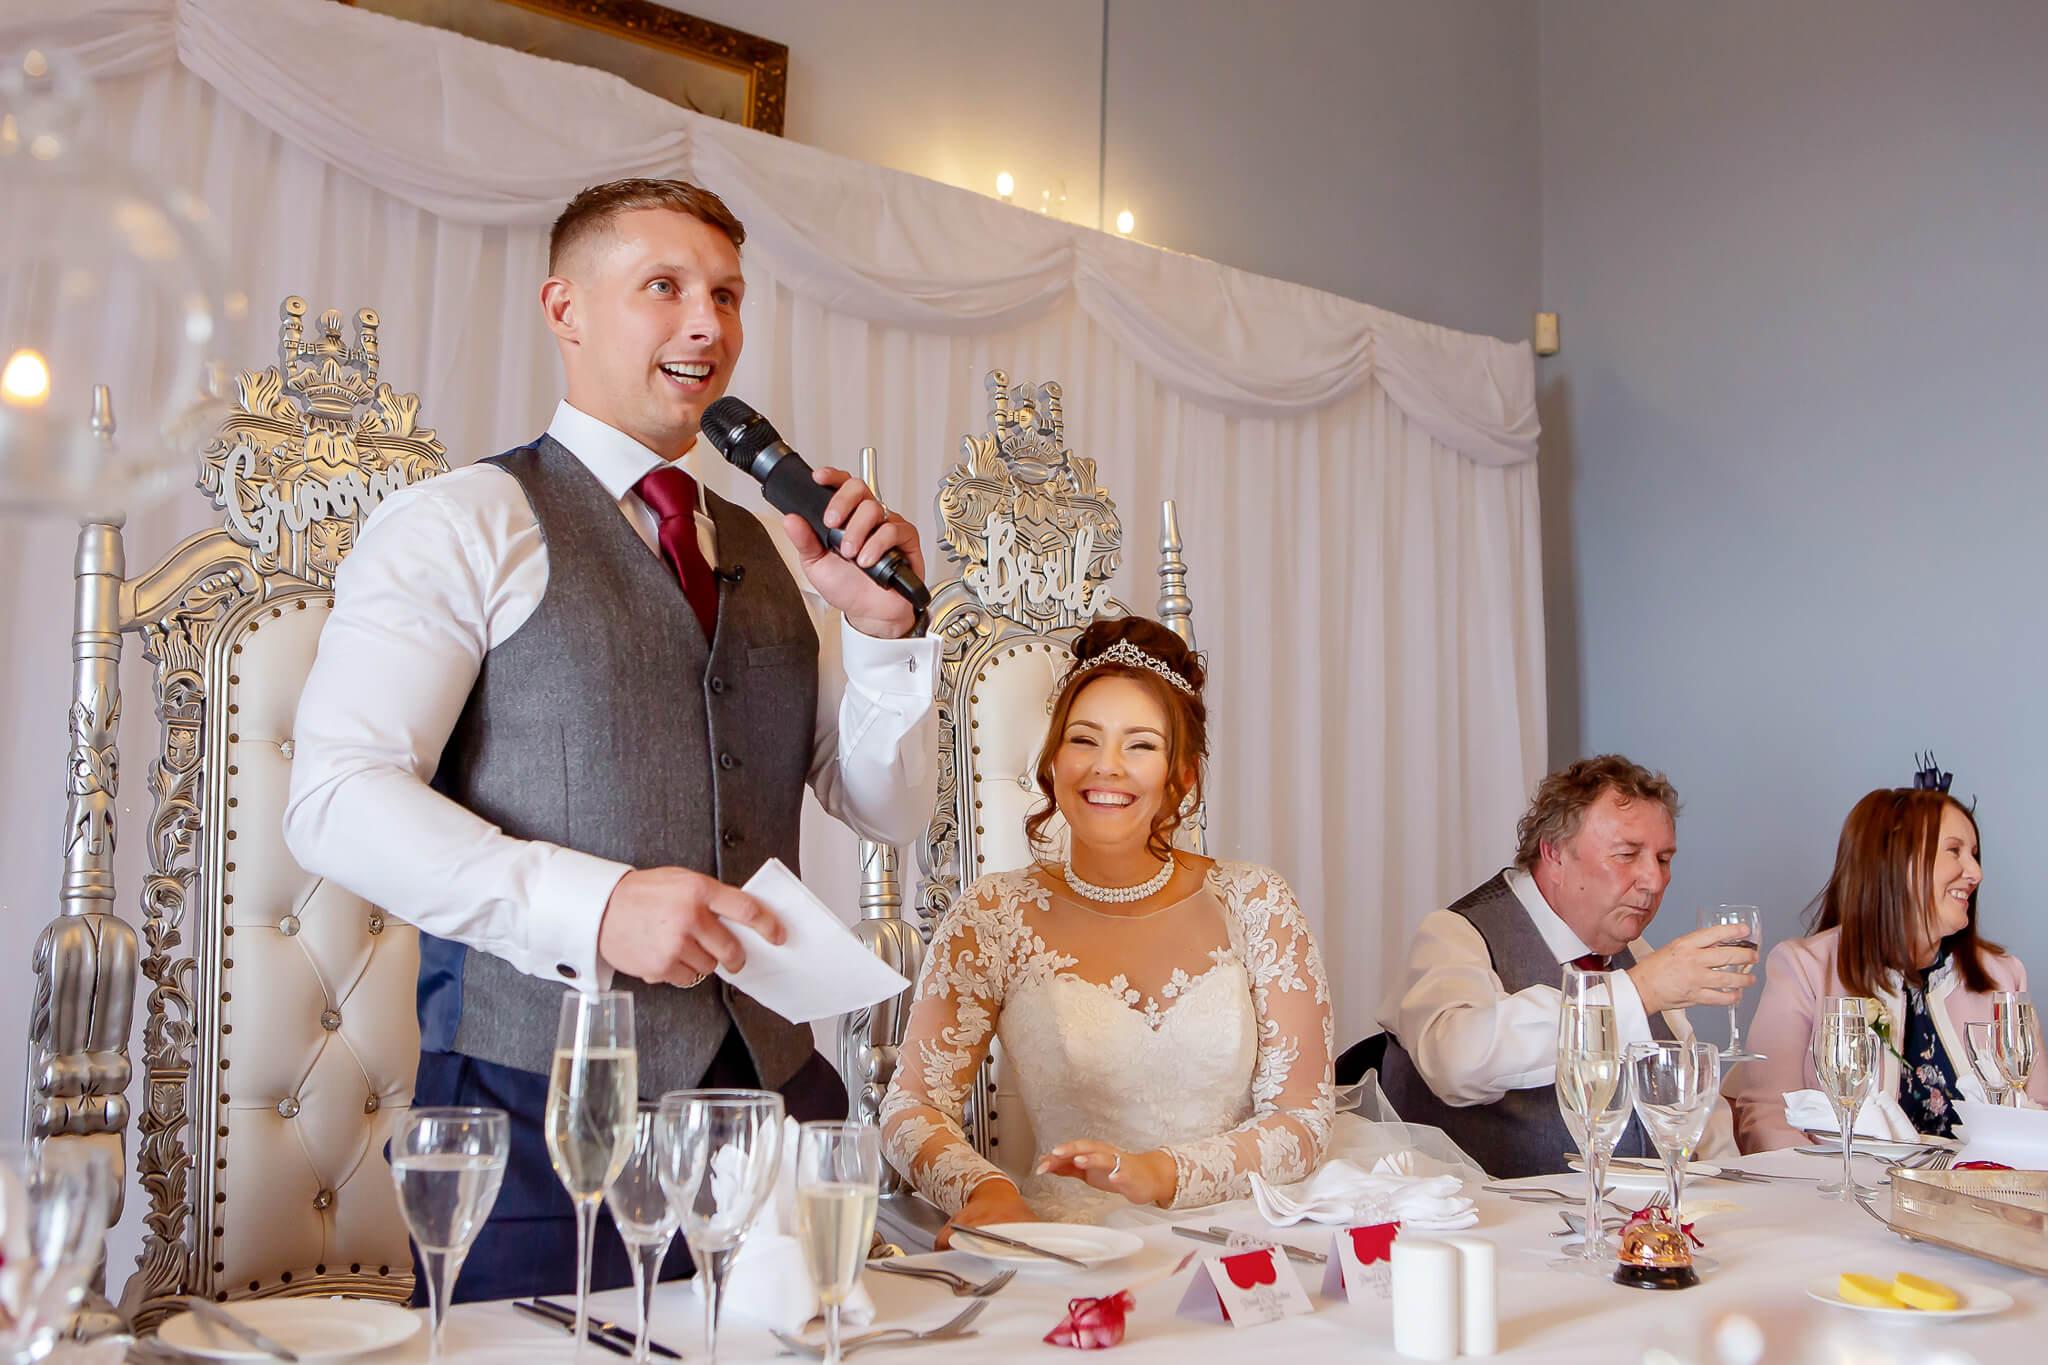 wigan-bride-groom-stanbury-wedding-photography